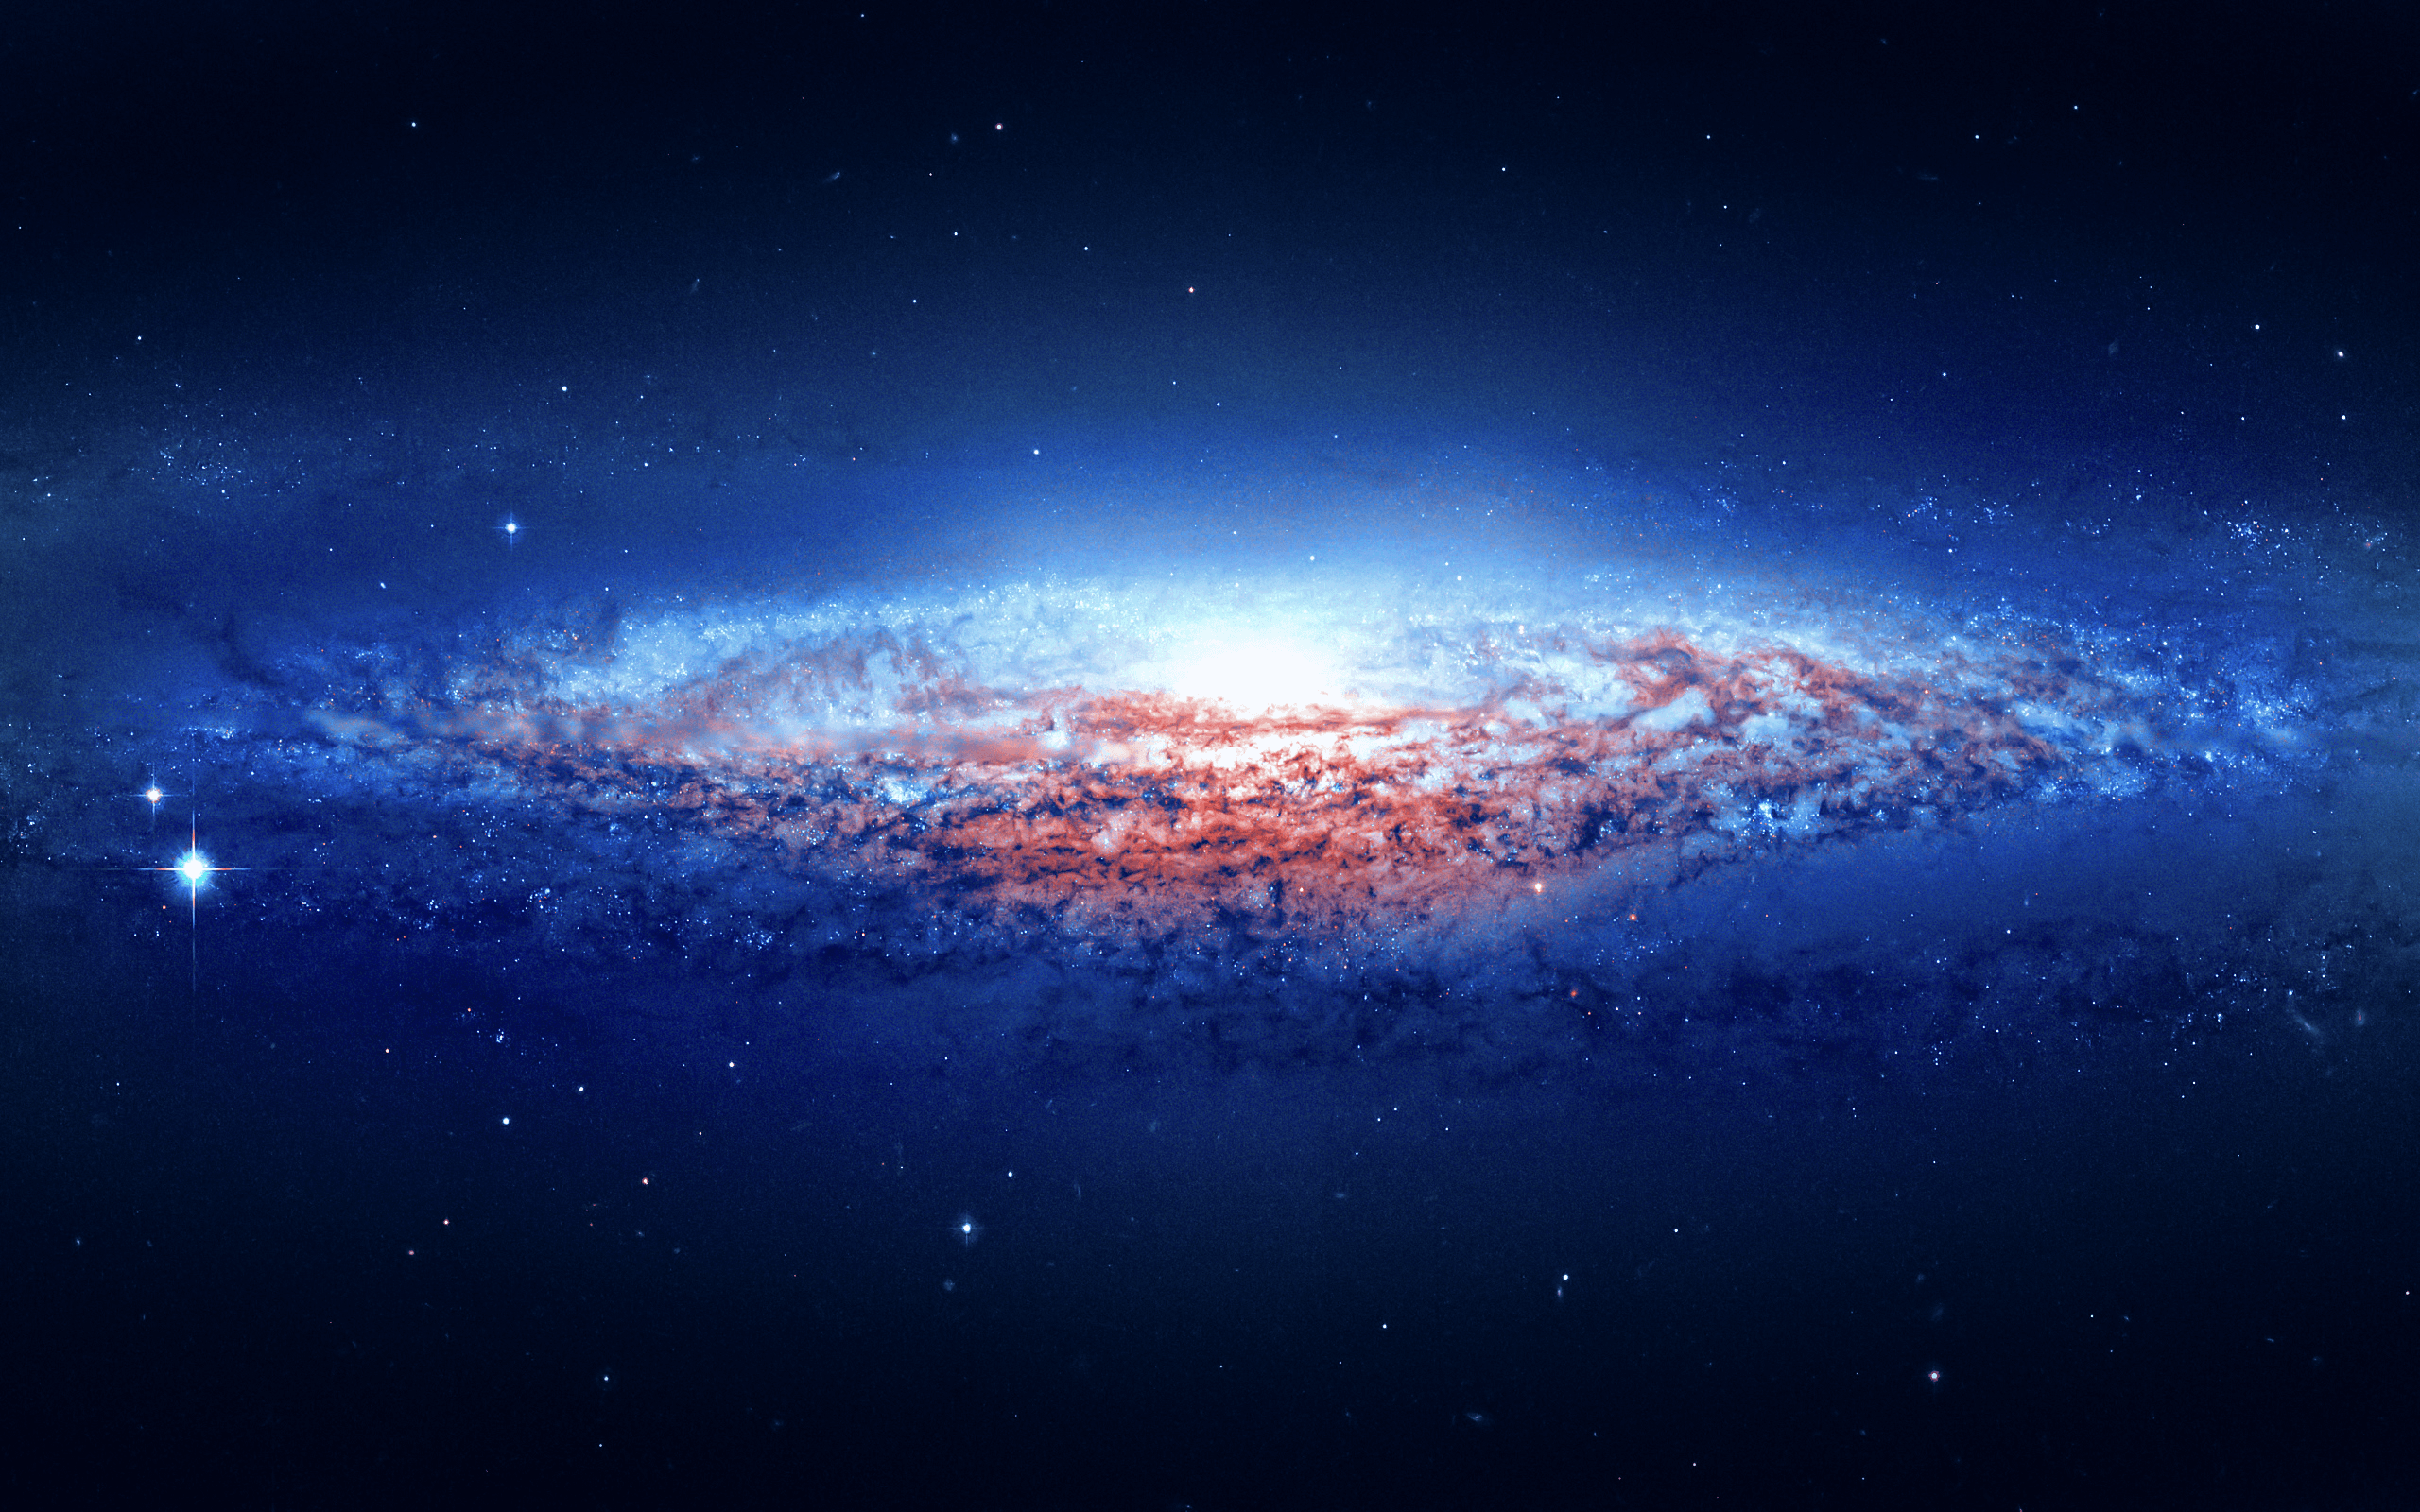 4K Ultra HD Galaxy Wallpapers.